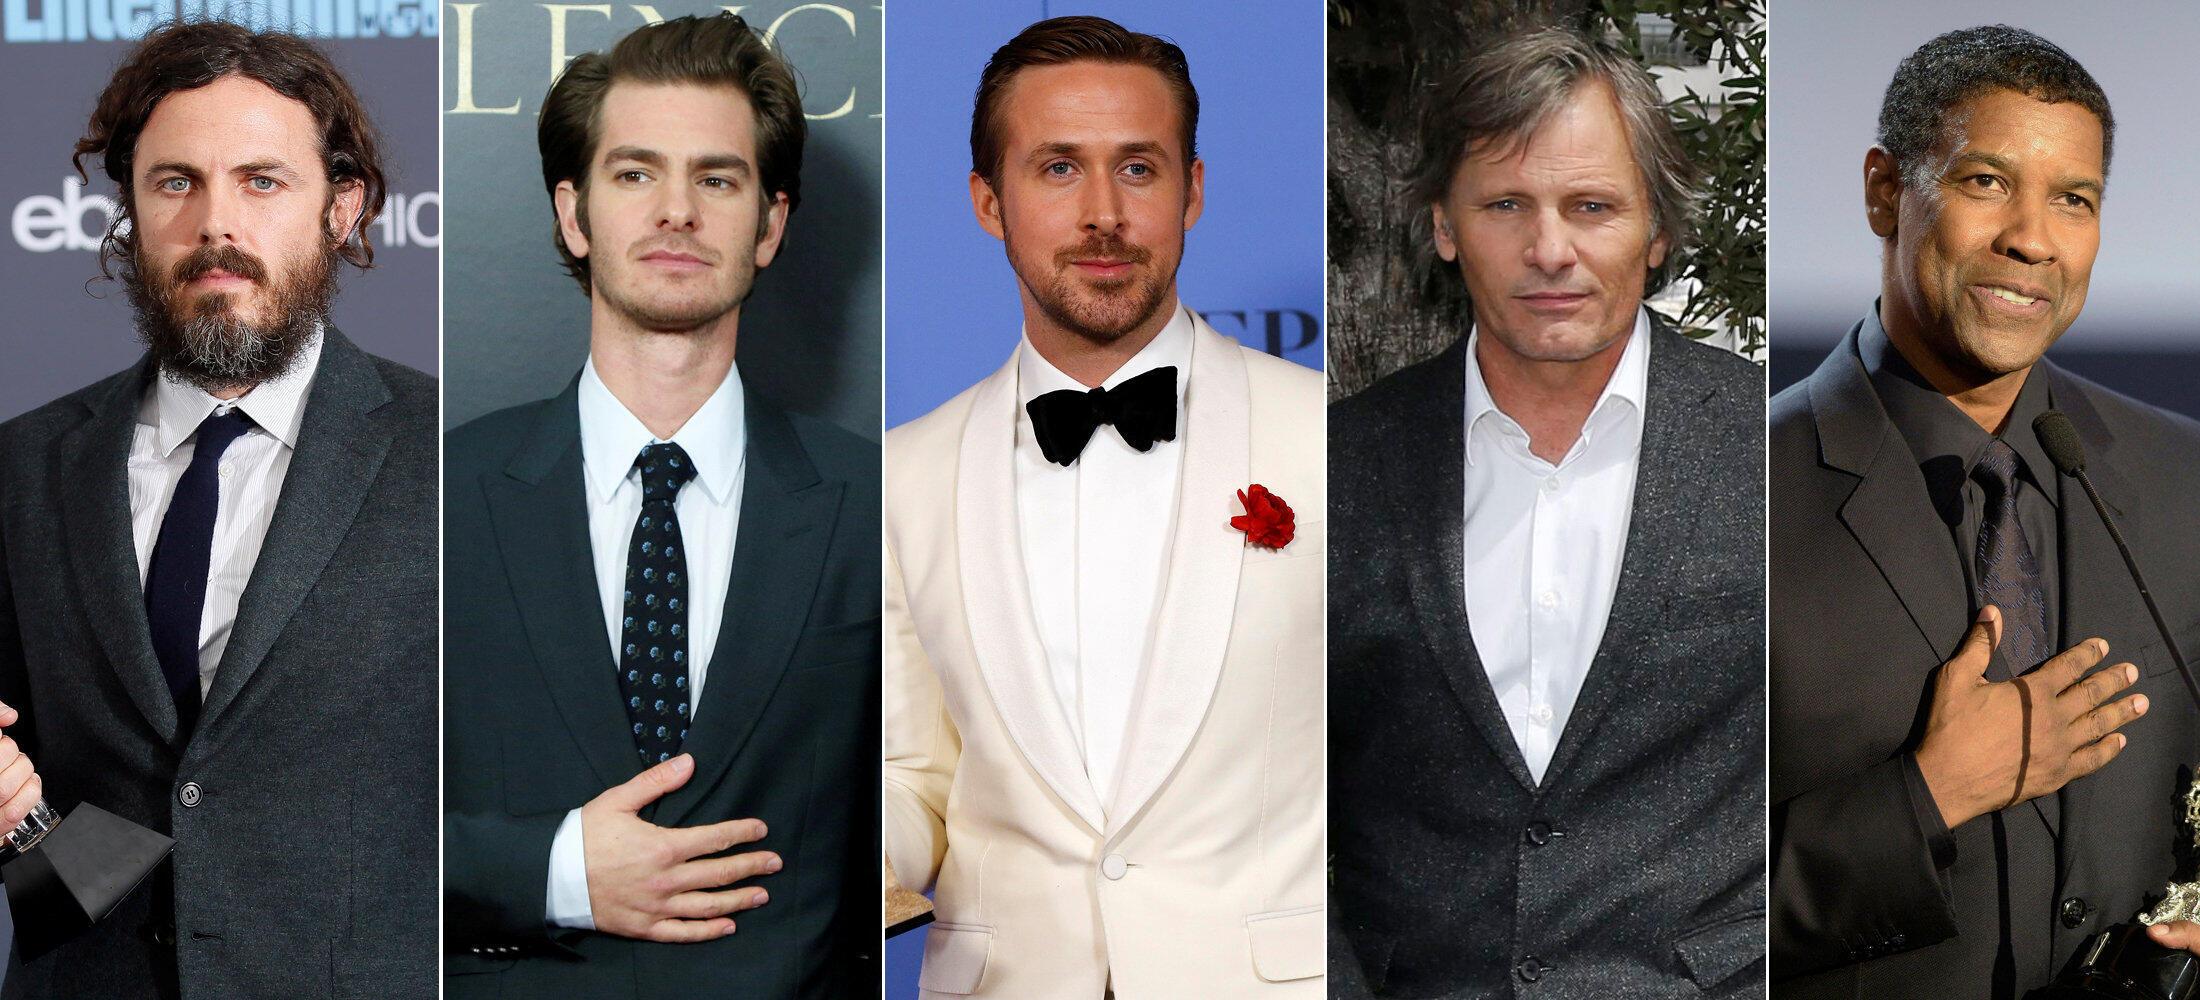 Casey Affleck, Andrew Garfield, Ryan Gosling, Viggo Mortensen e Denzel Washington